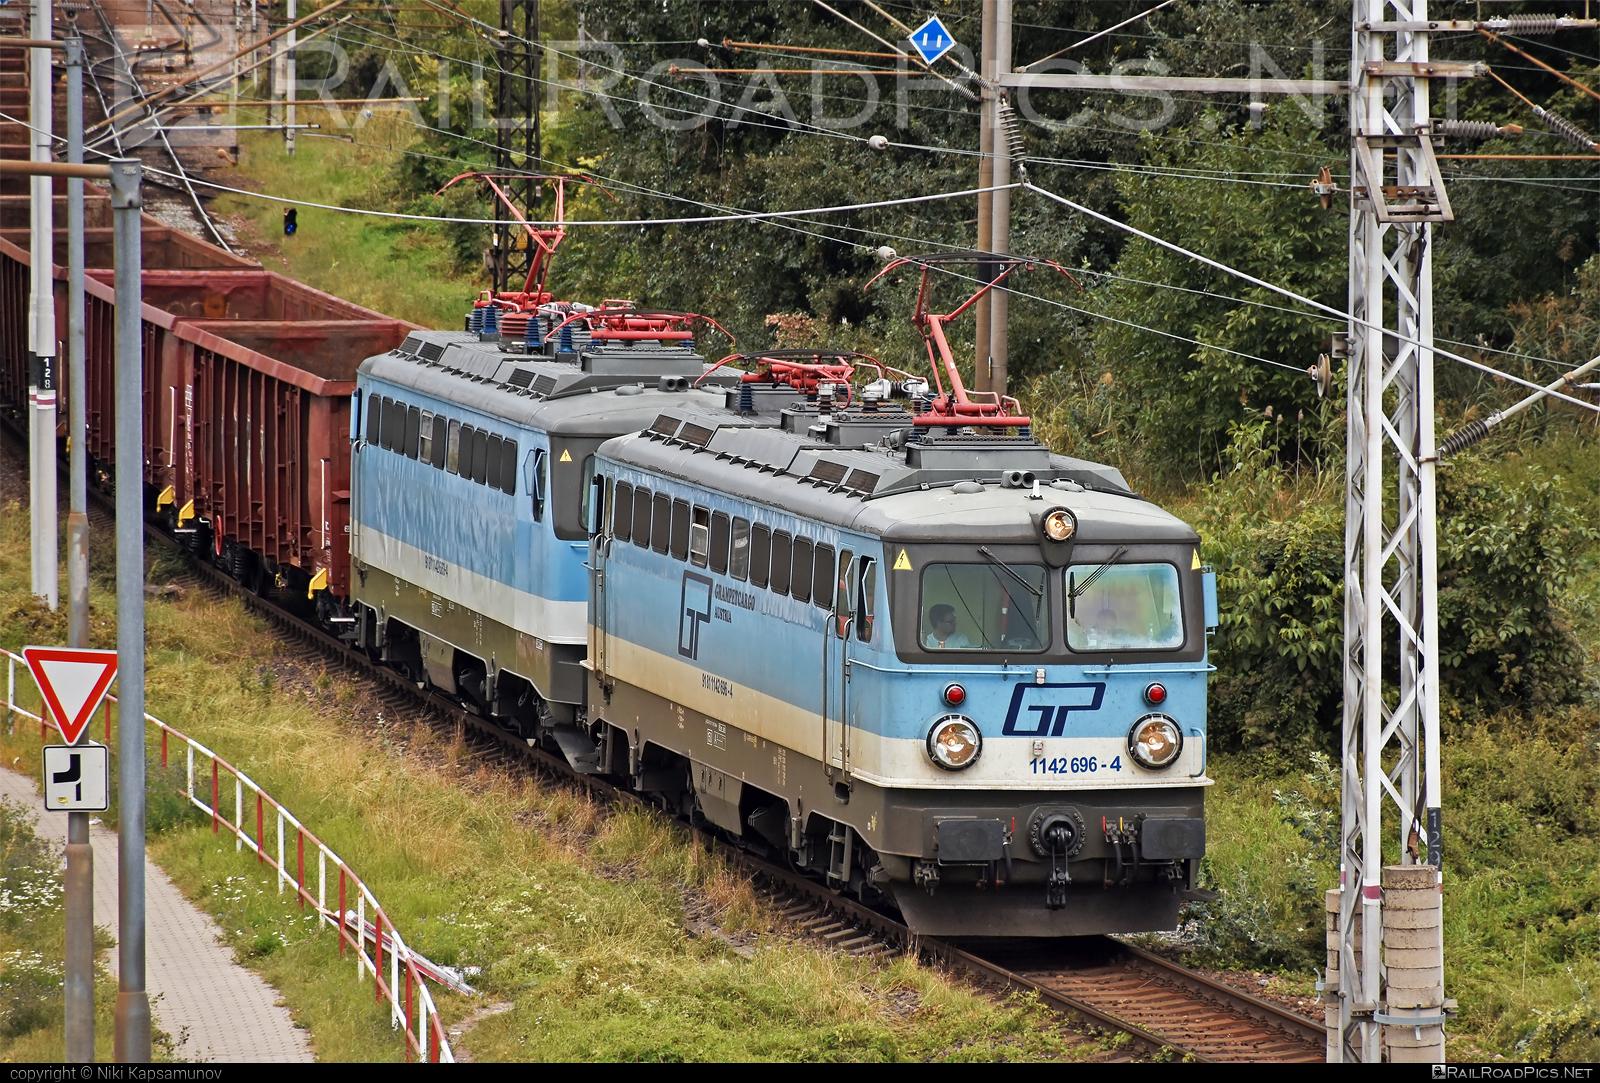 SGP ÖBB Class 1142 - 1142 696-4 operated by Grampetcargo Austria #GrampetcargoAustria #gca #grampetcargo #obbclass1142 #sgp #sgp1142 #simmeringgrazpauker